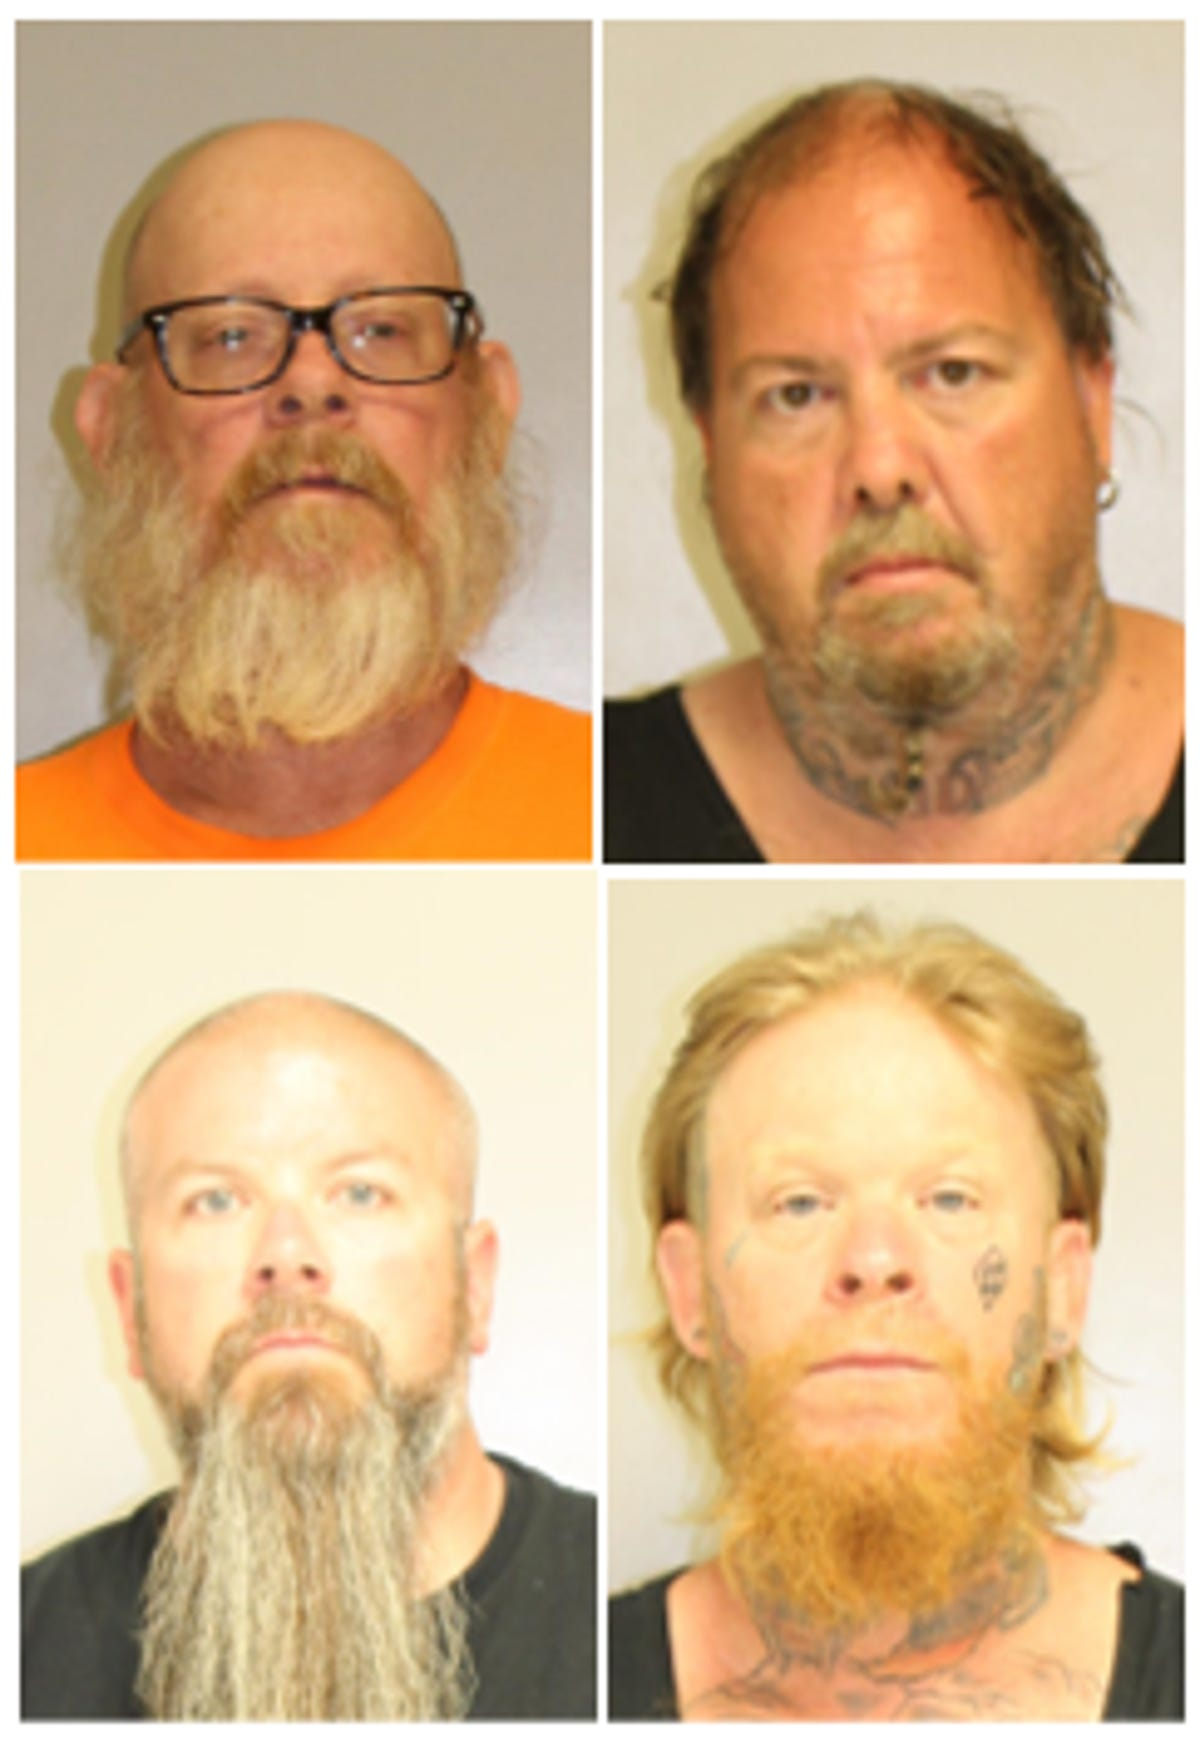 Pagan's motorcycle gang members threaten Franklin County man